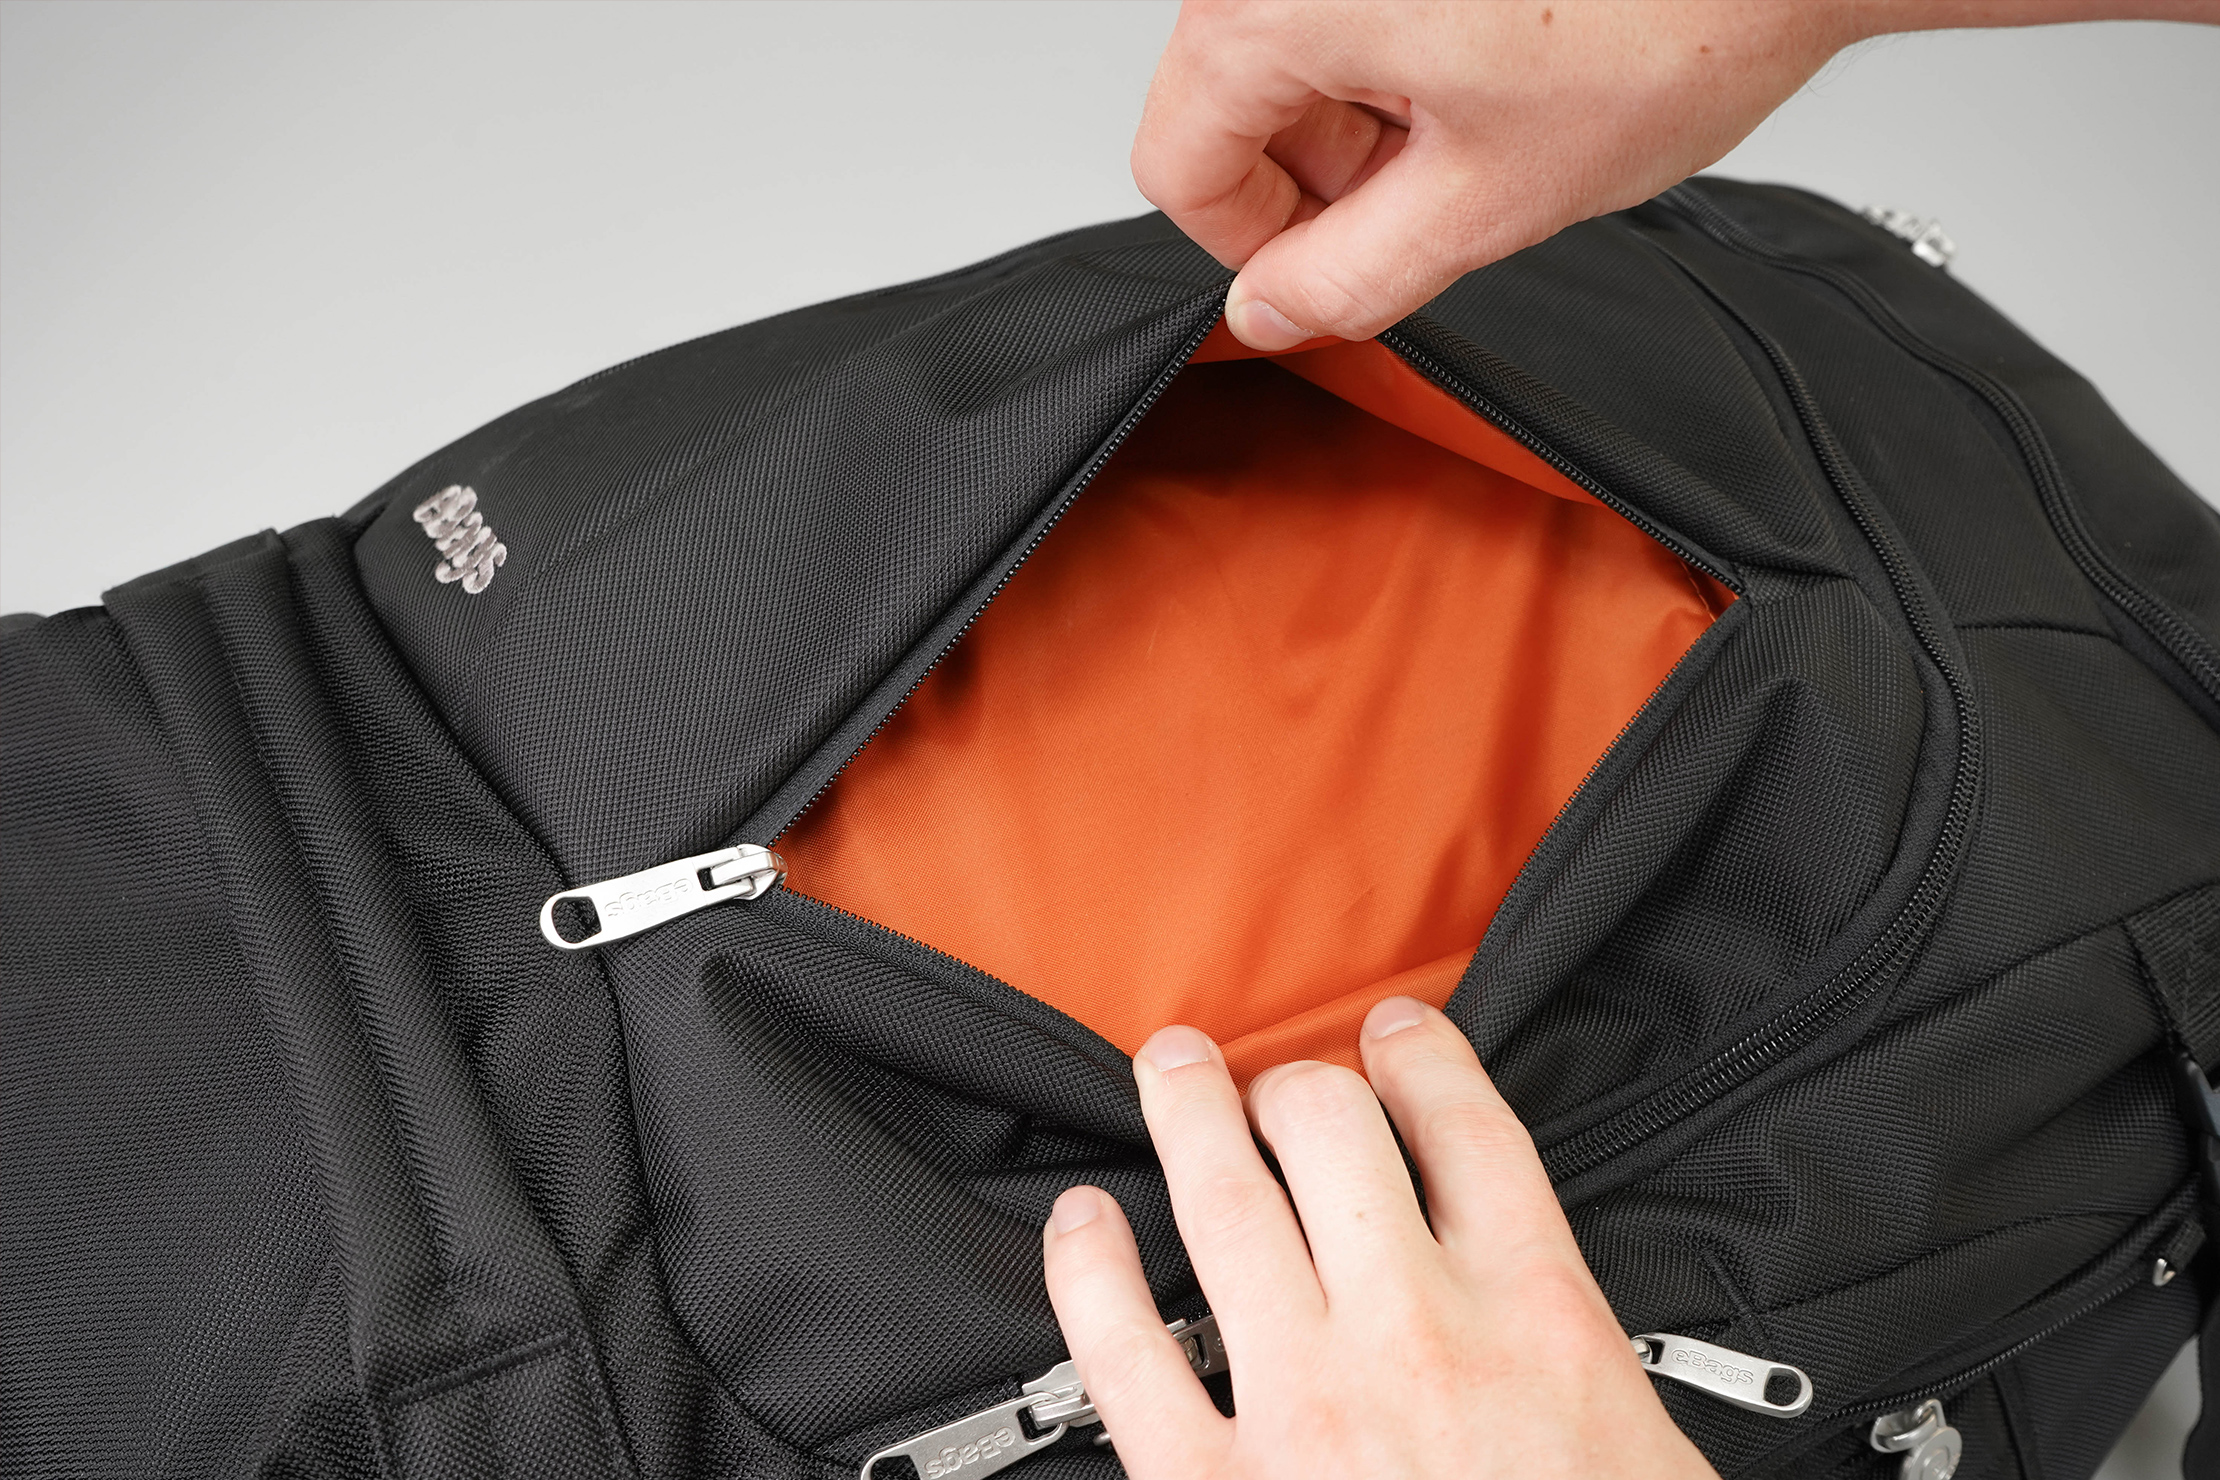 eBags TLS Mother Lode Weekender Convertible Front Pocket